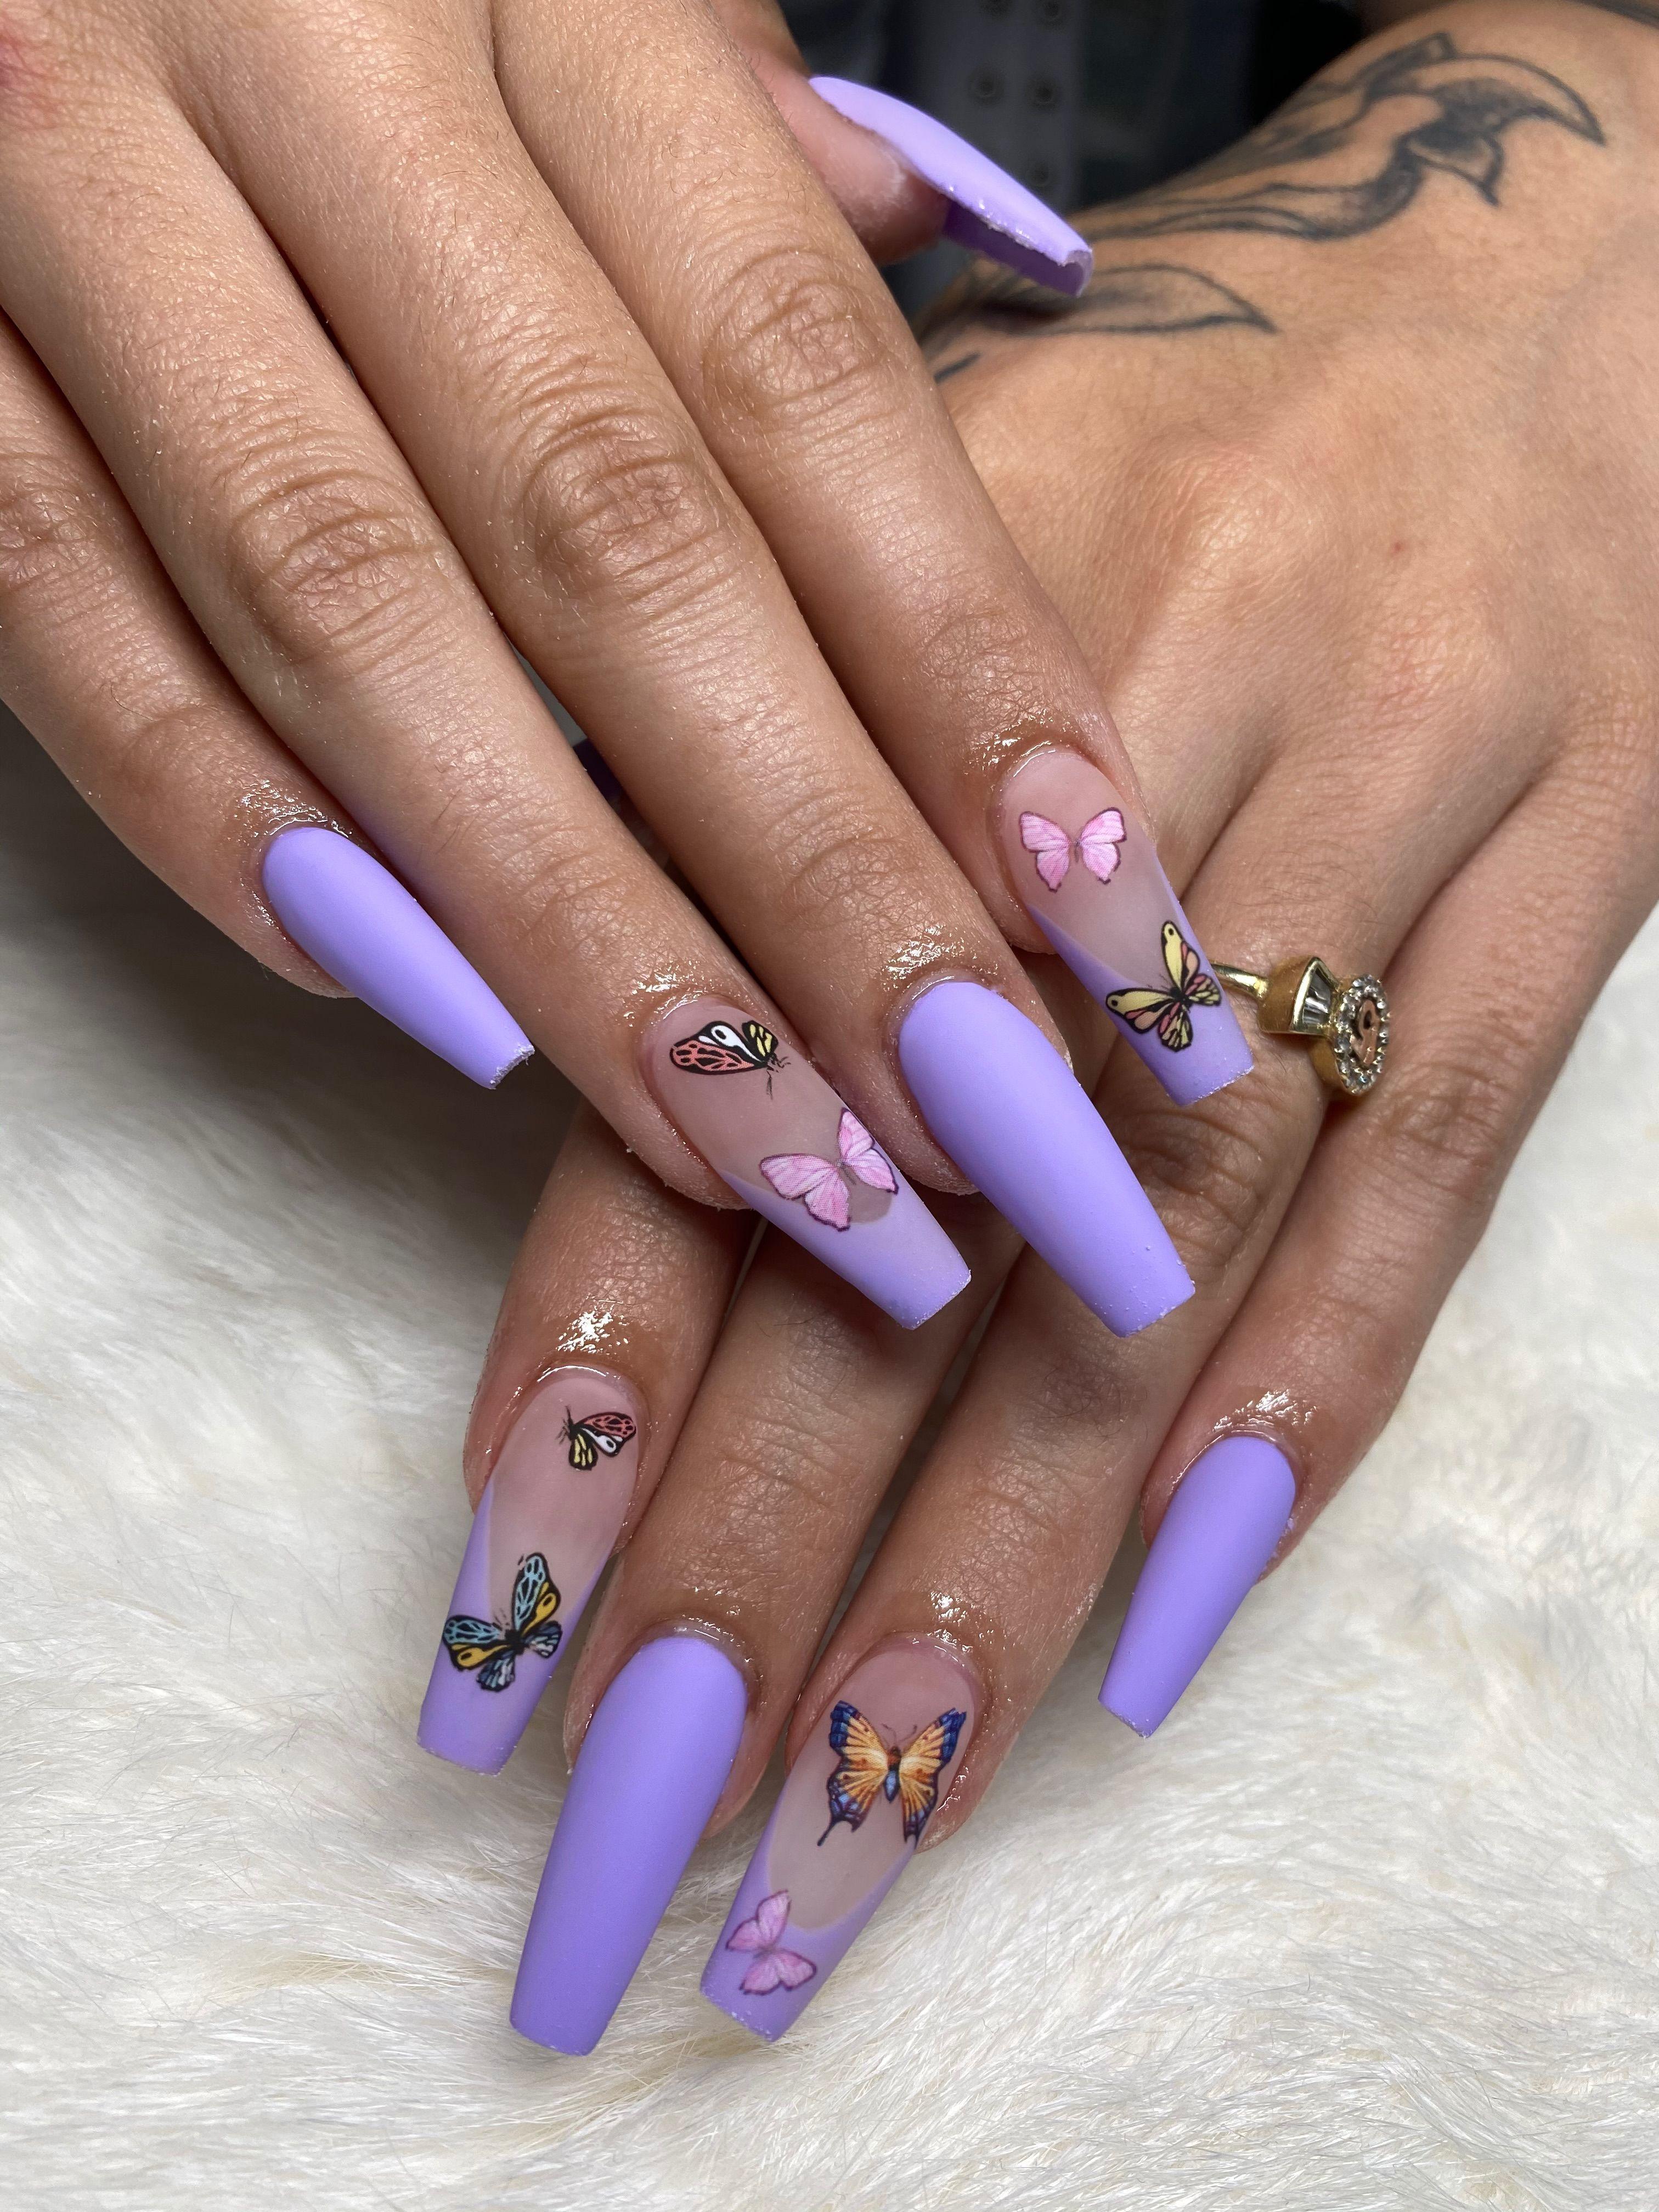 Matte Purple Butterfly Acrylic Nails In 2020 Purple Acrylic Nails Long Acrylic Nails Coffin Bling Acrylic Nails